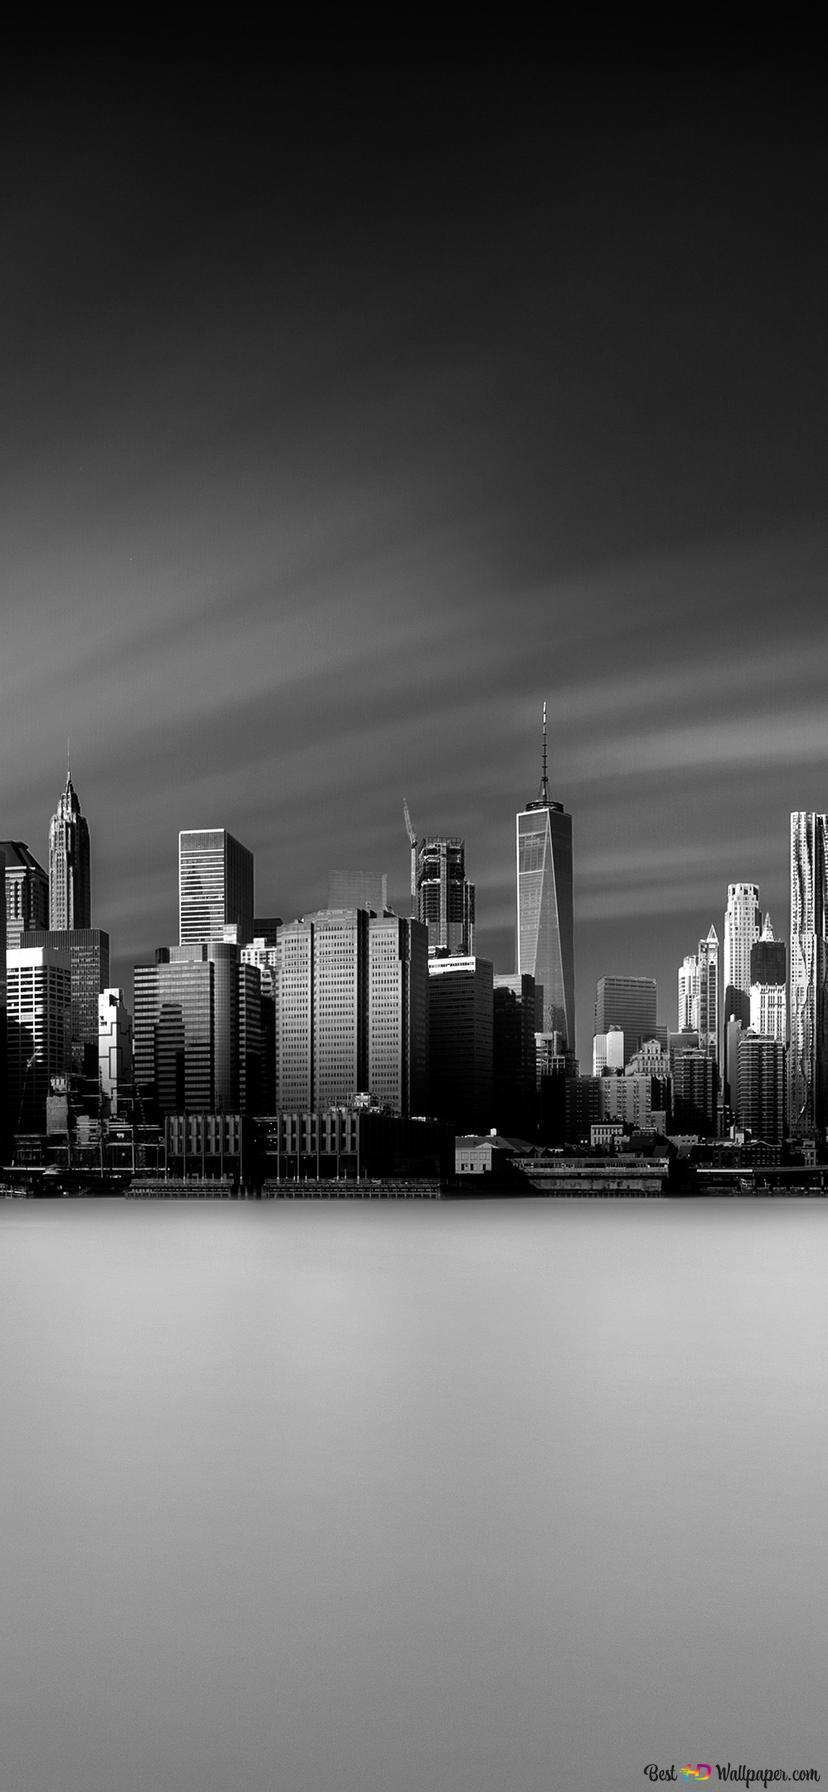 Grand City Of New York Hd Wallpaper Download